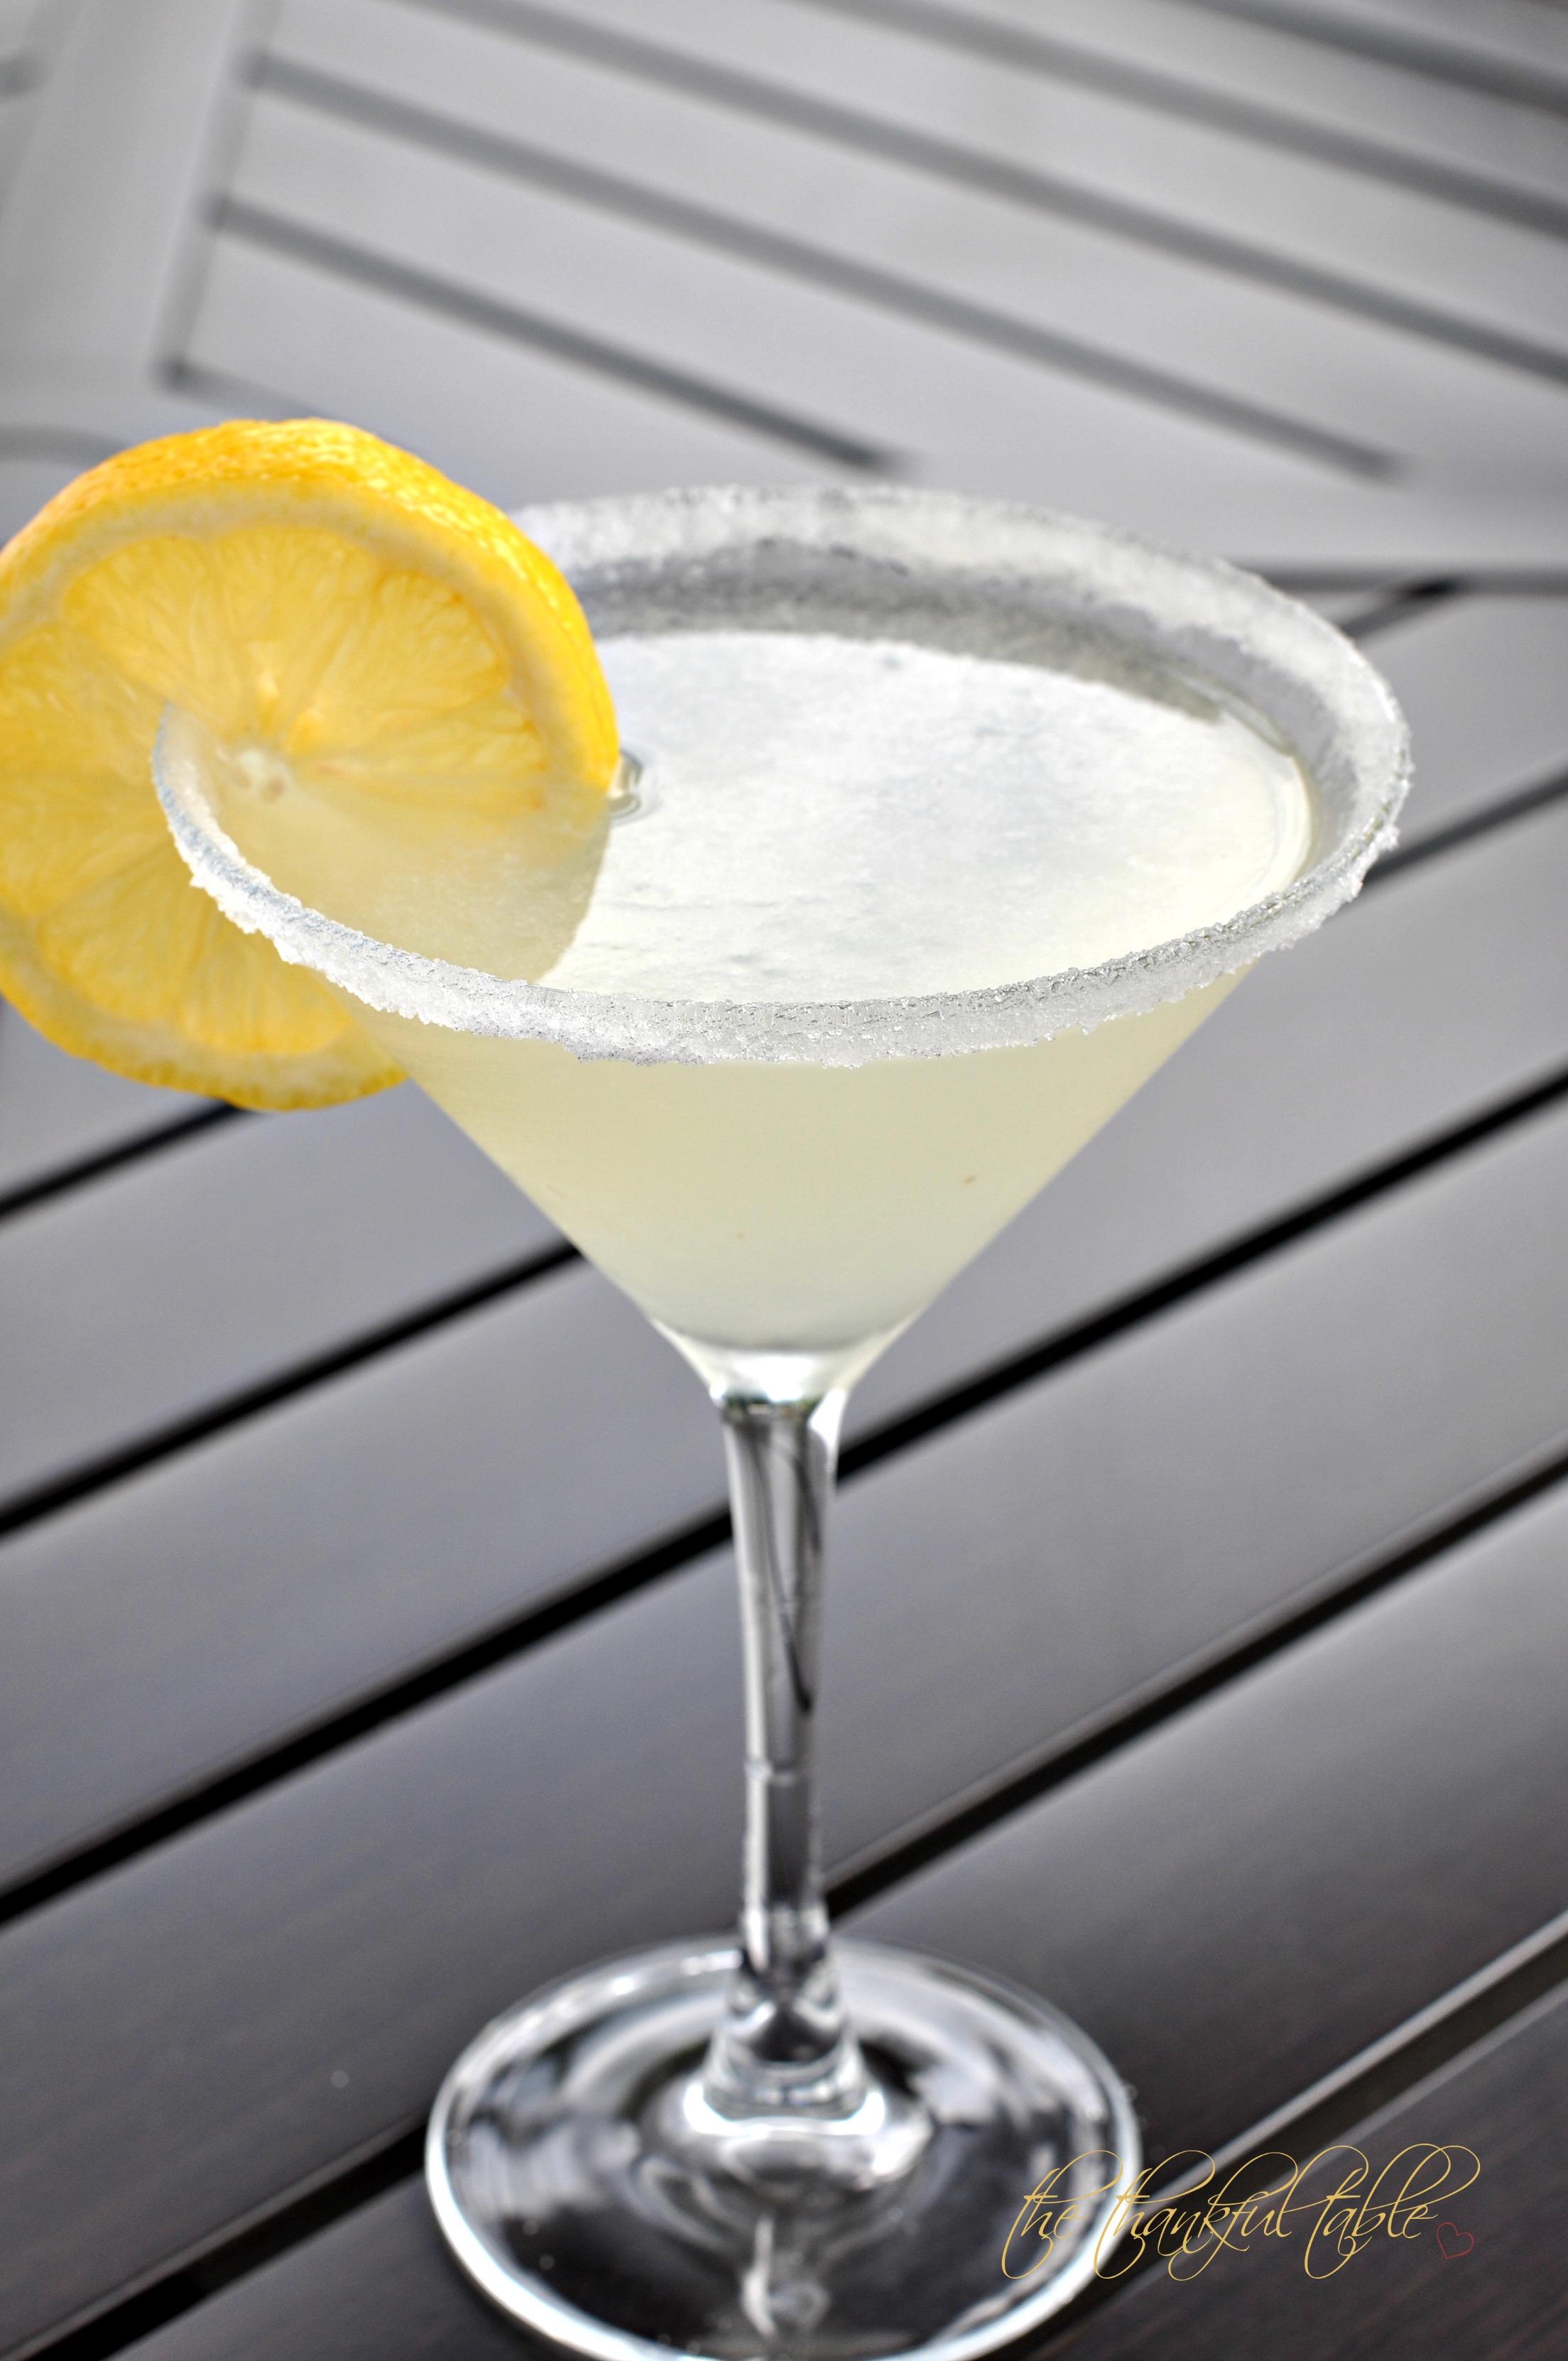 The Thankful Table Blog Archive Lemon Drop Martini Watermelon Wallpaper Rainbow Find Free HD for Desktop [freshlhys.tk]